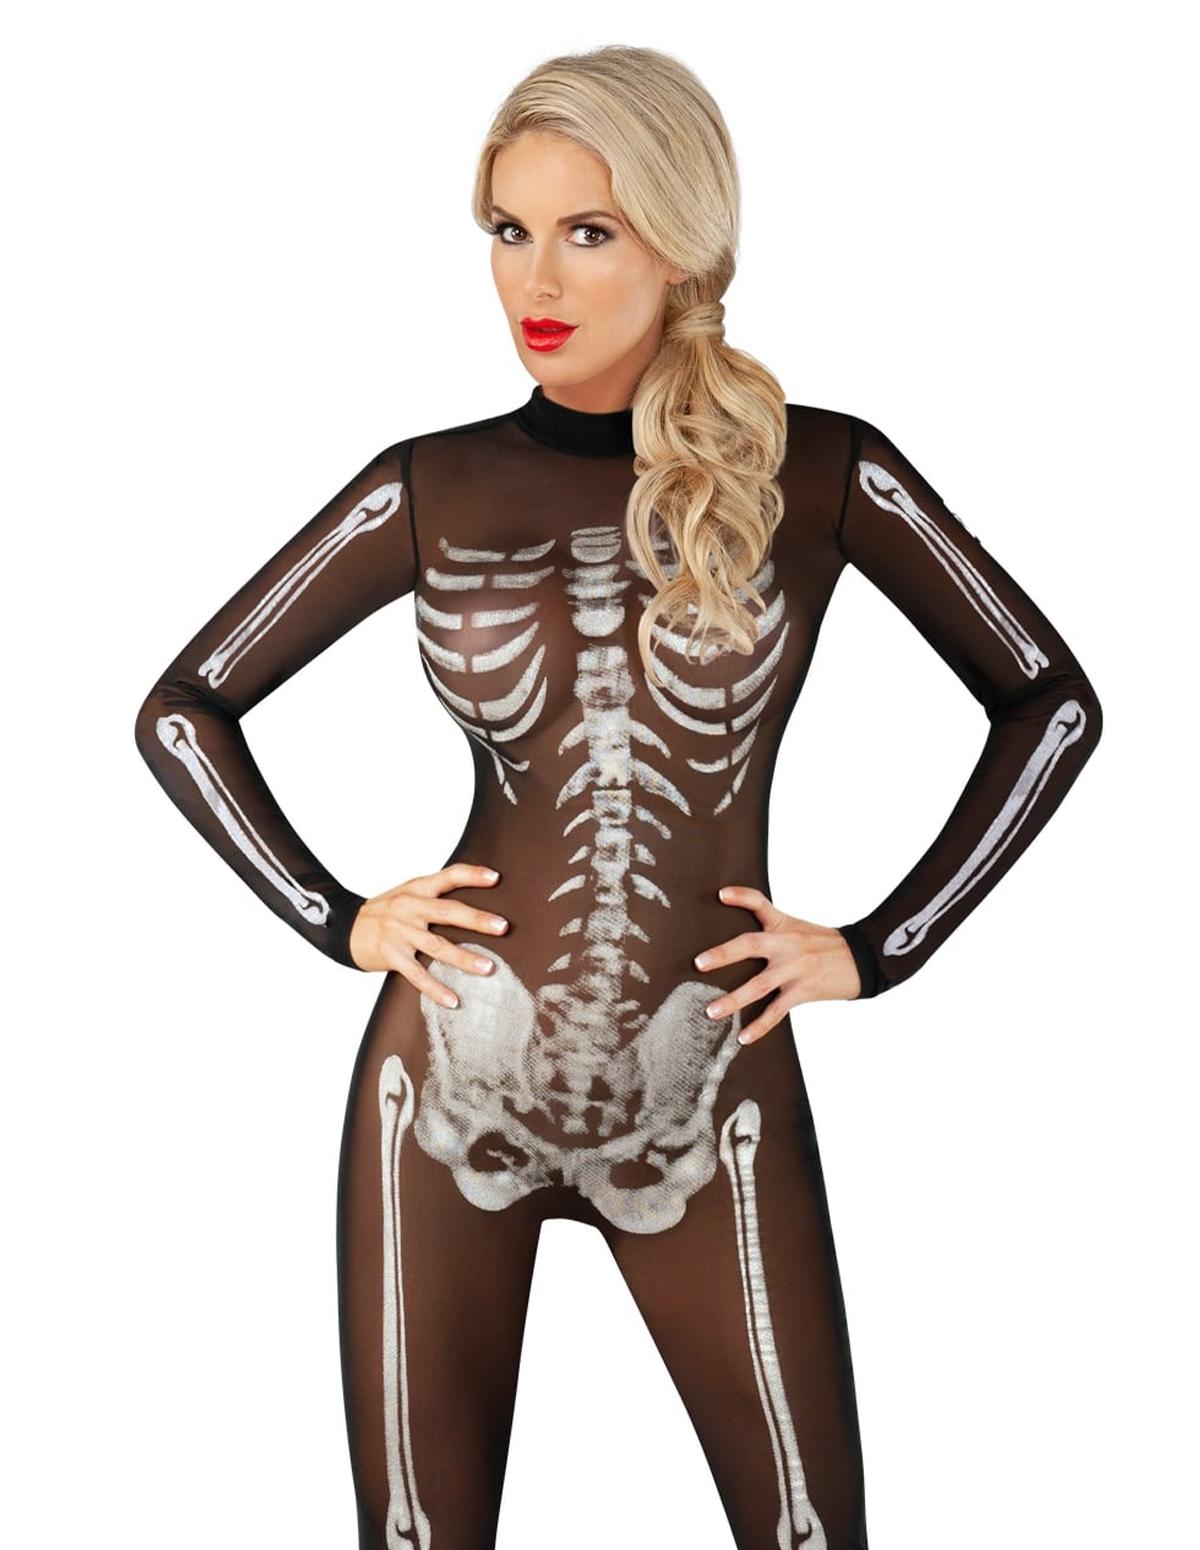 Scantily Skeletal Body Suit